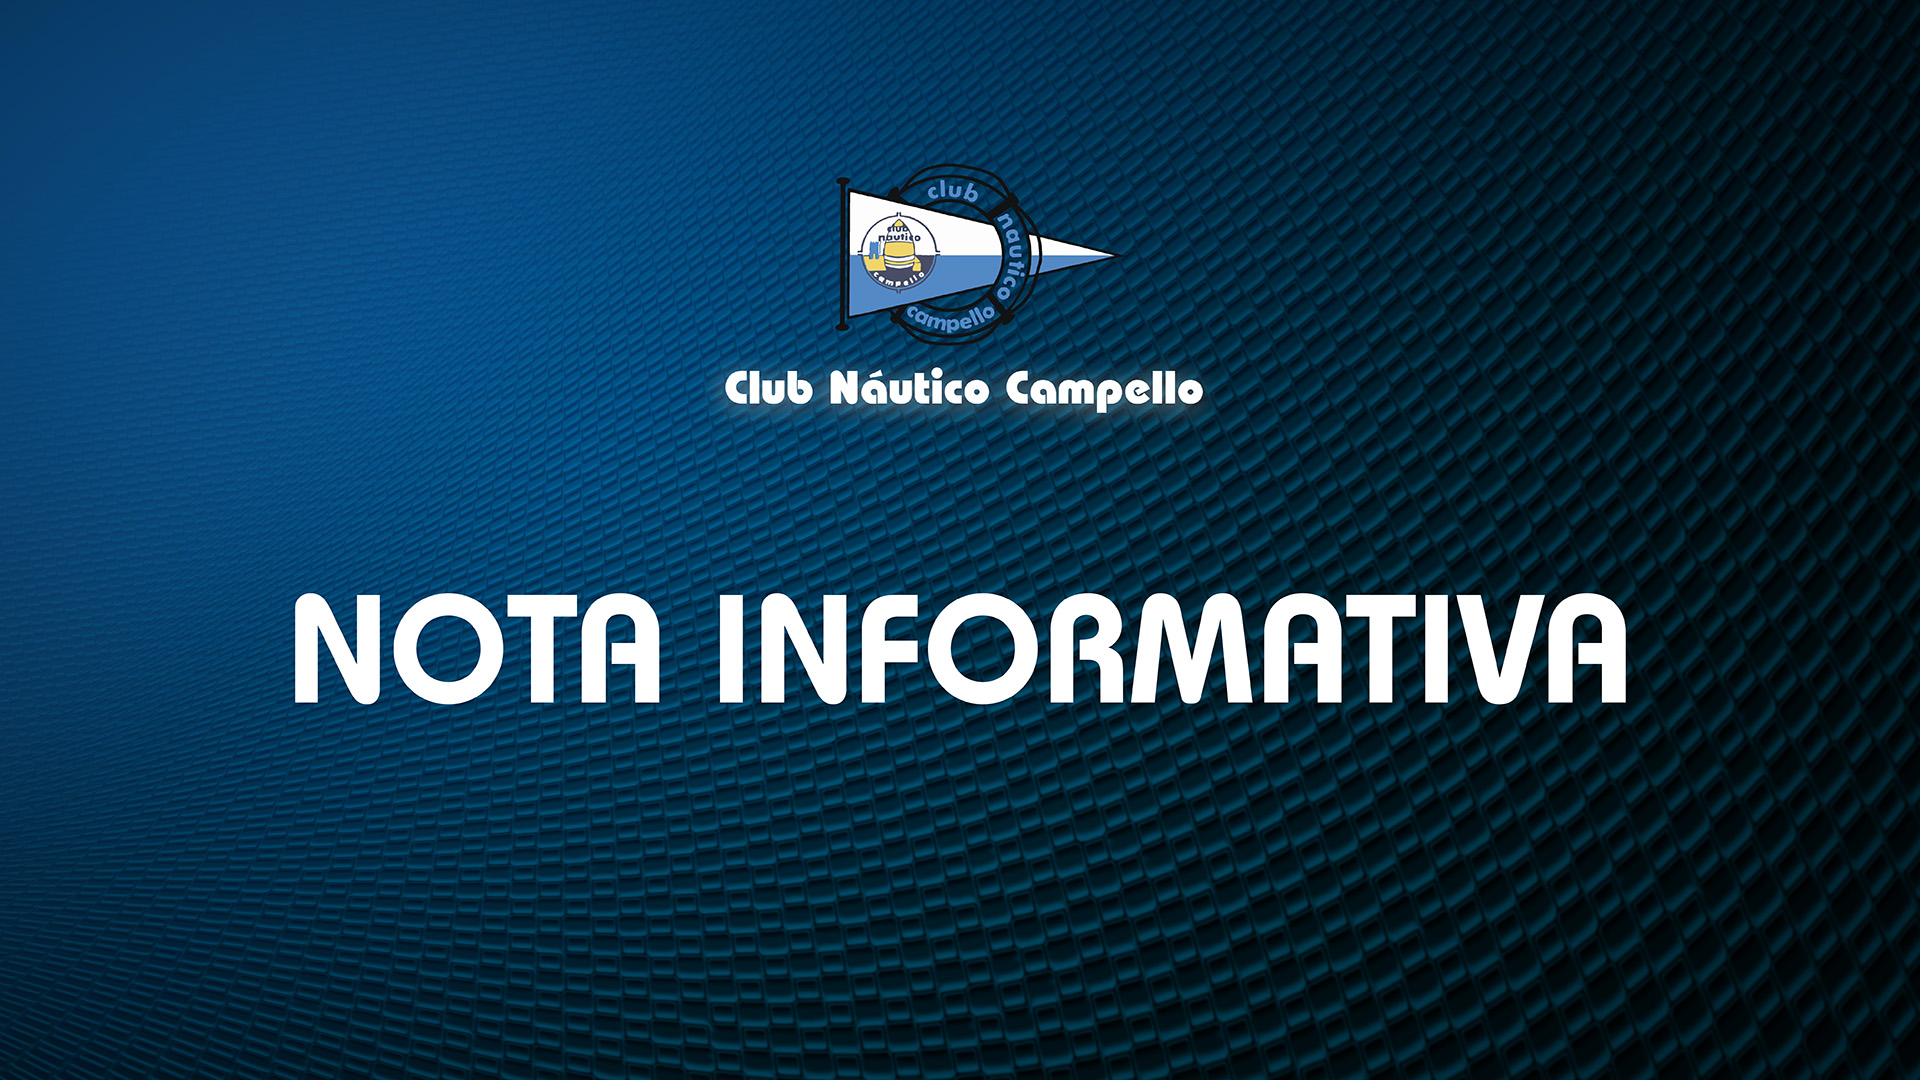 Nota Informativa - Club Náutico Campello